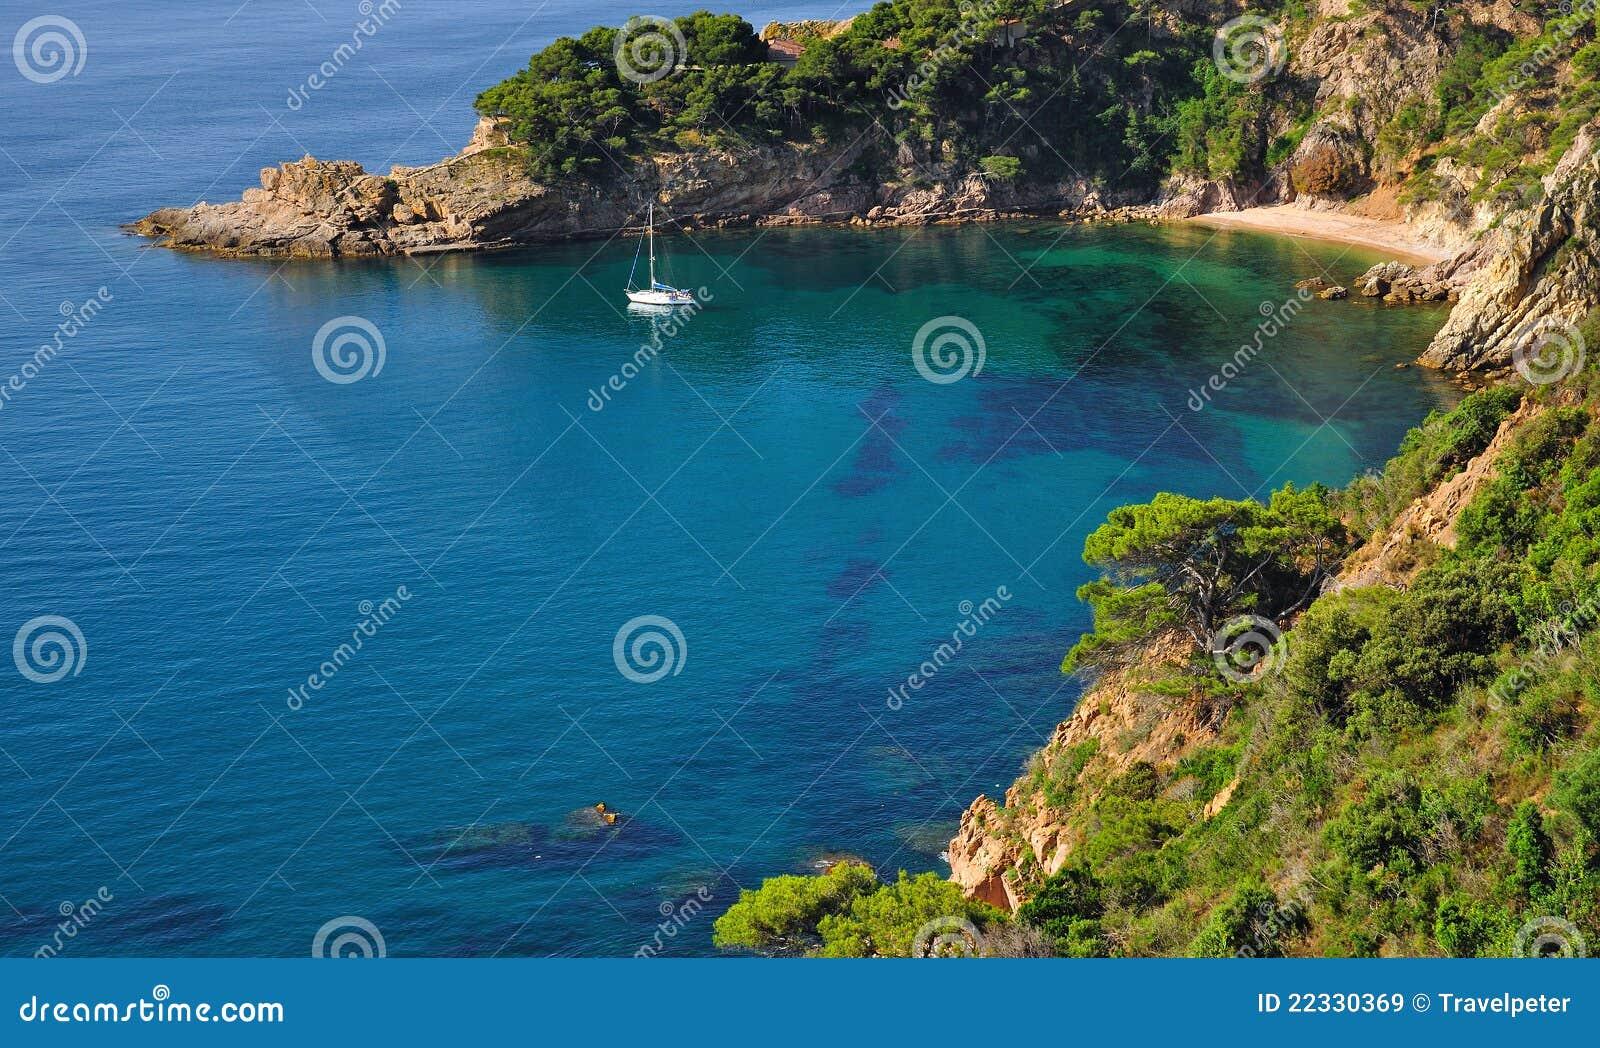 Costa Brava The Wild Coast 3